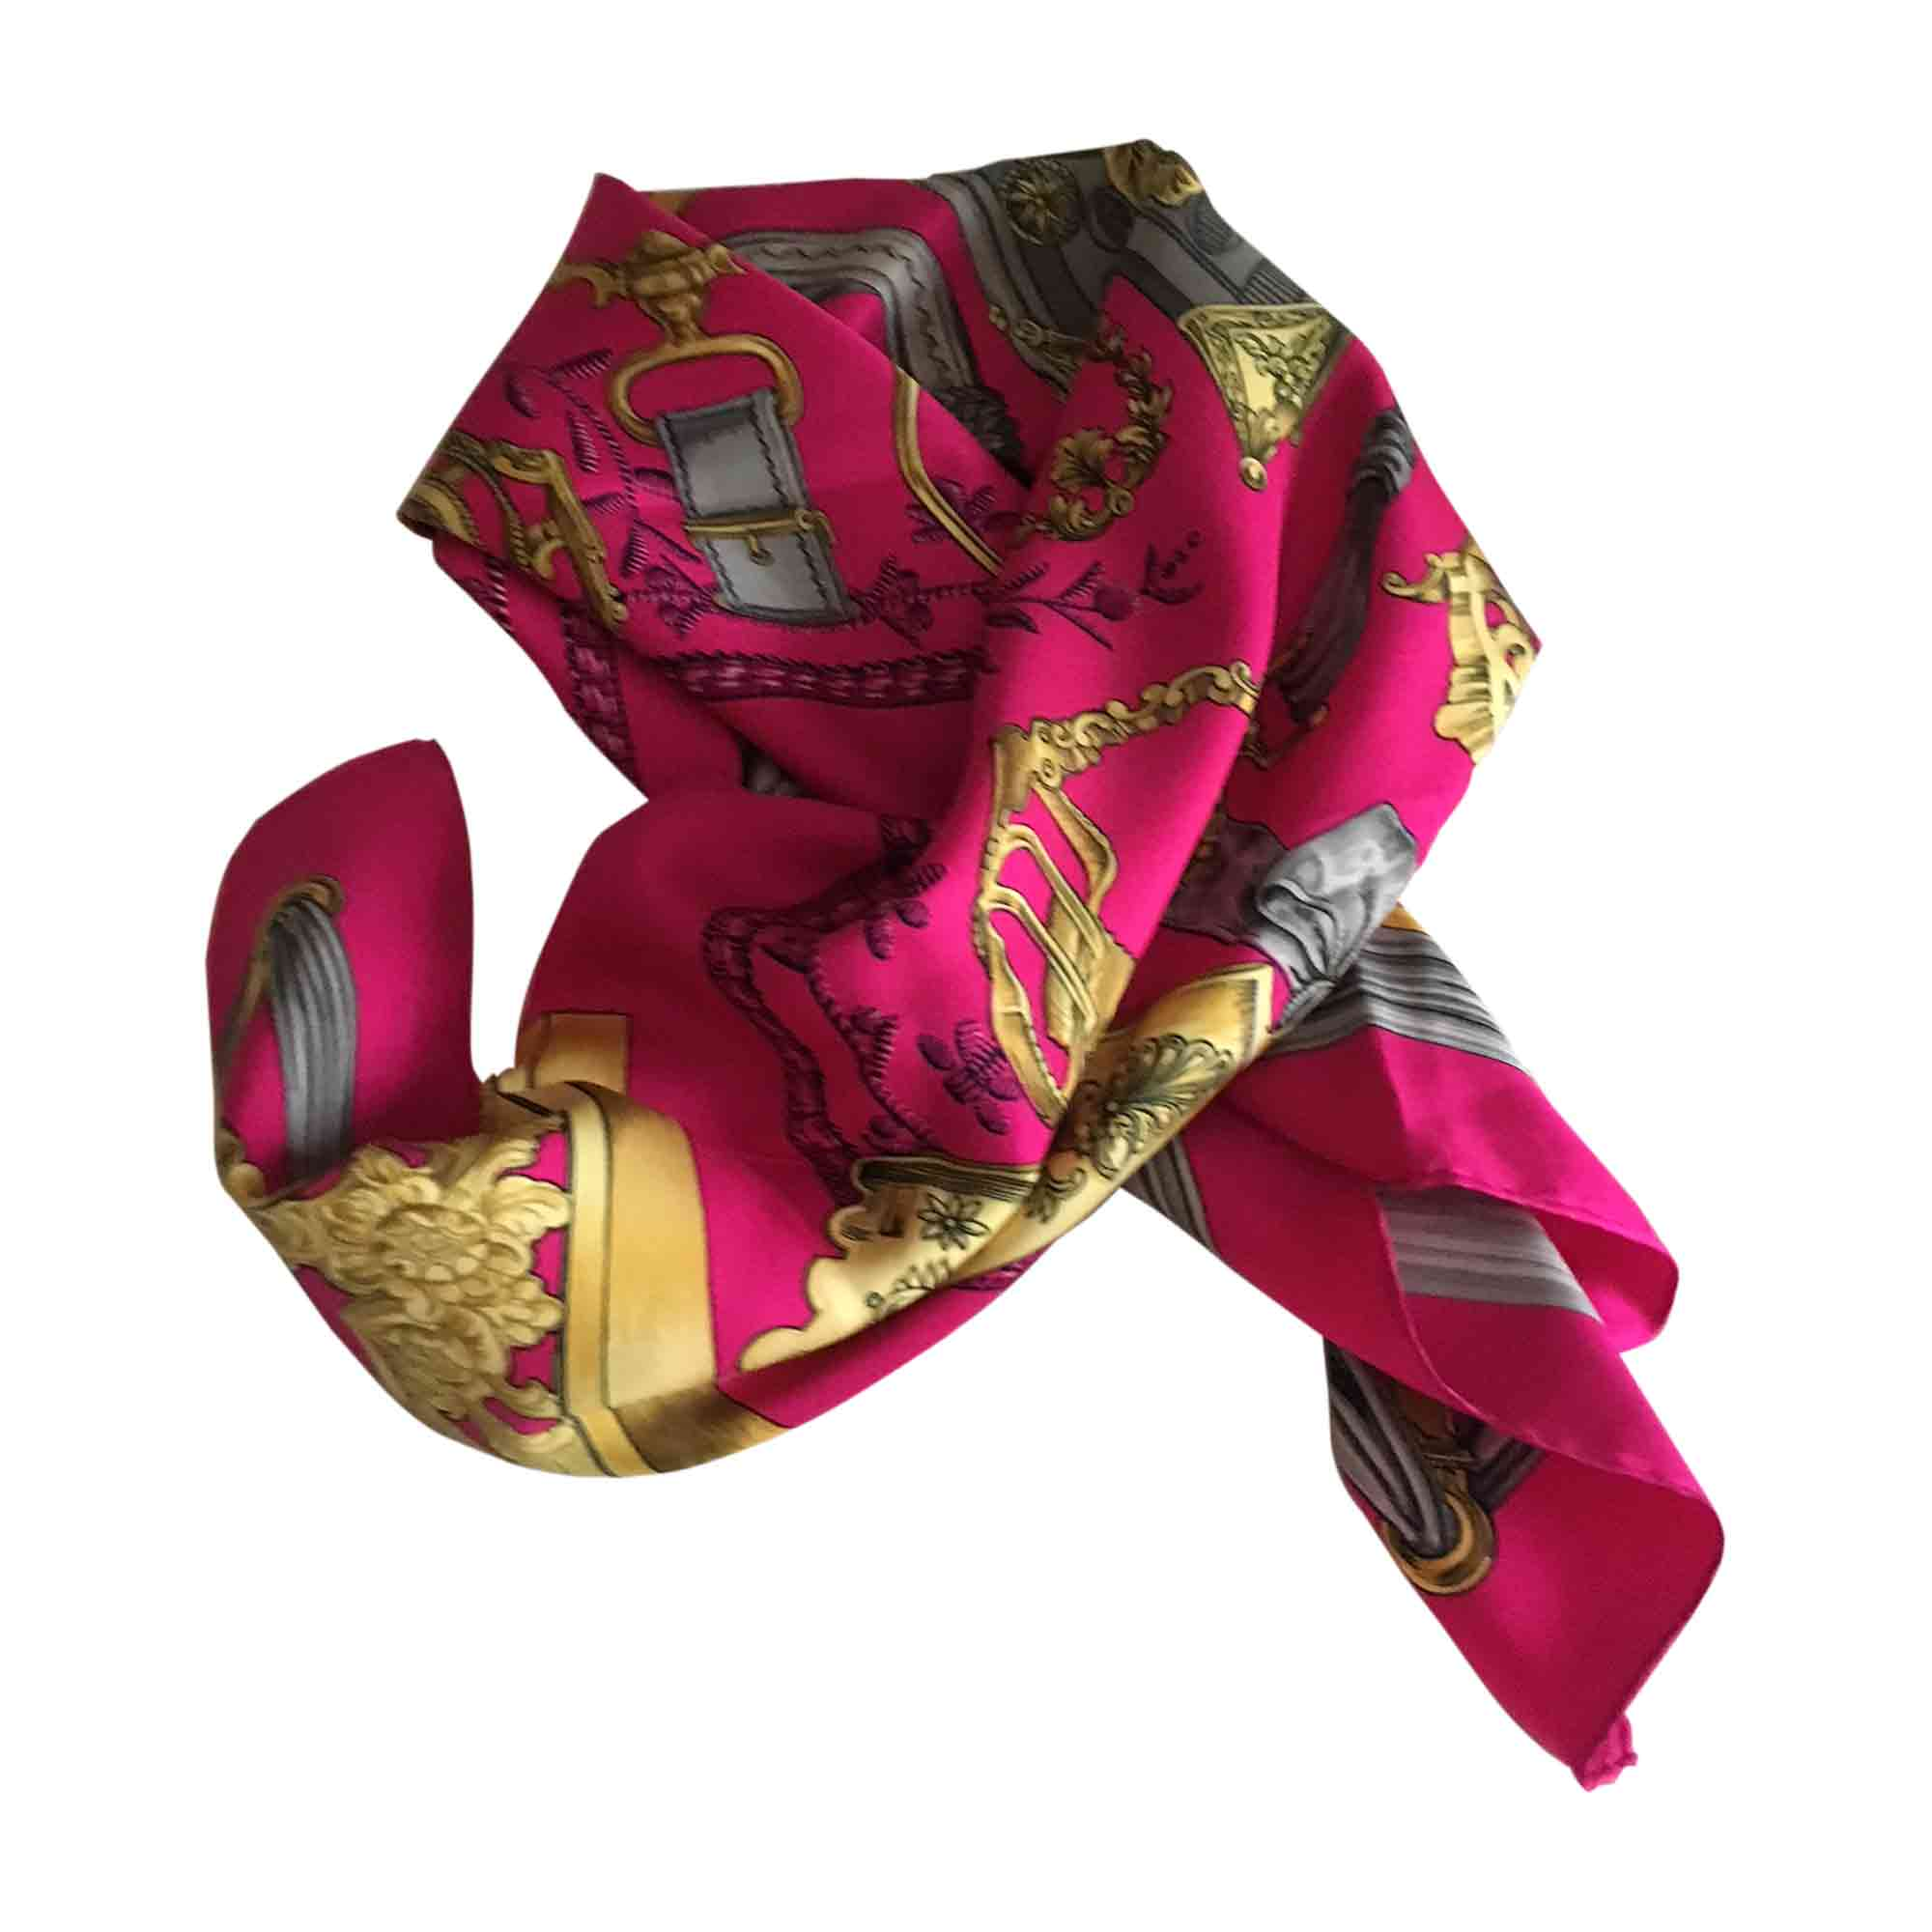 Foulard HERMÈS rose vendu par Betty 18217472 - 7182613 0e827d4f28e